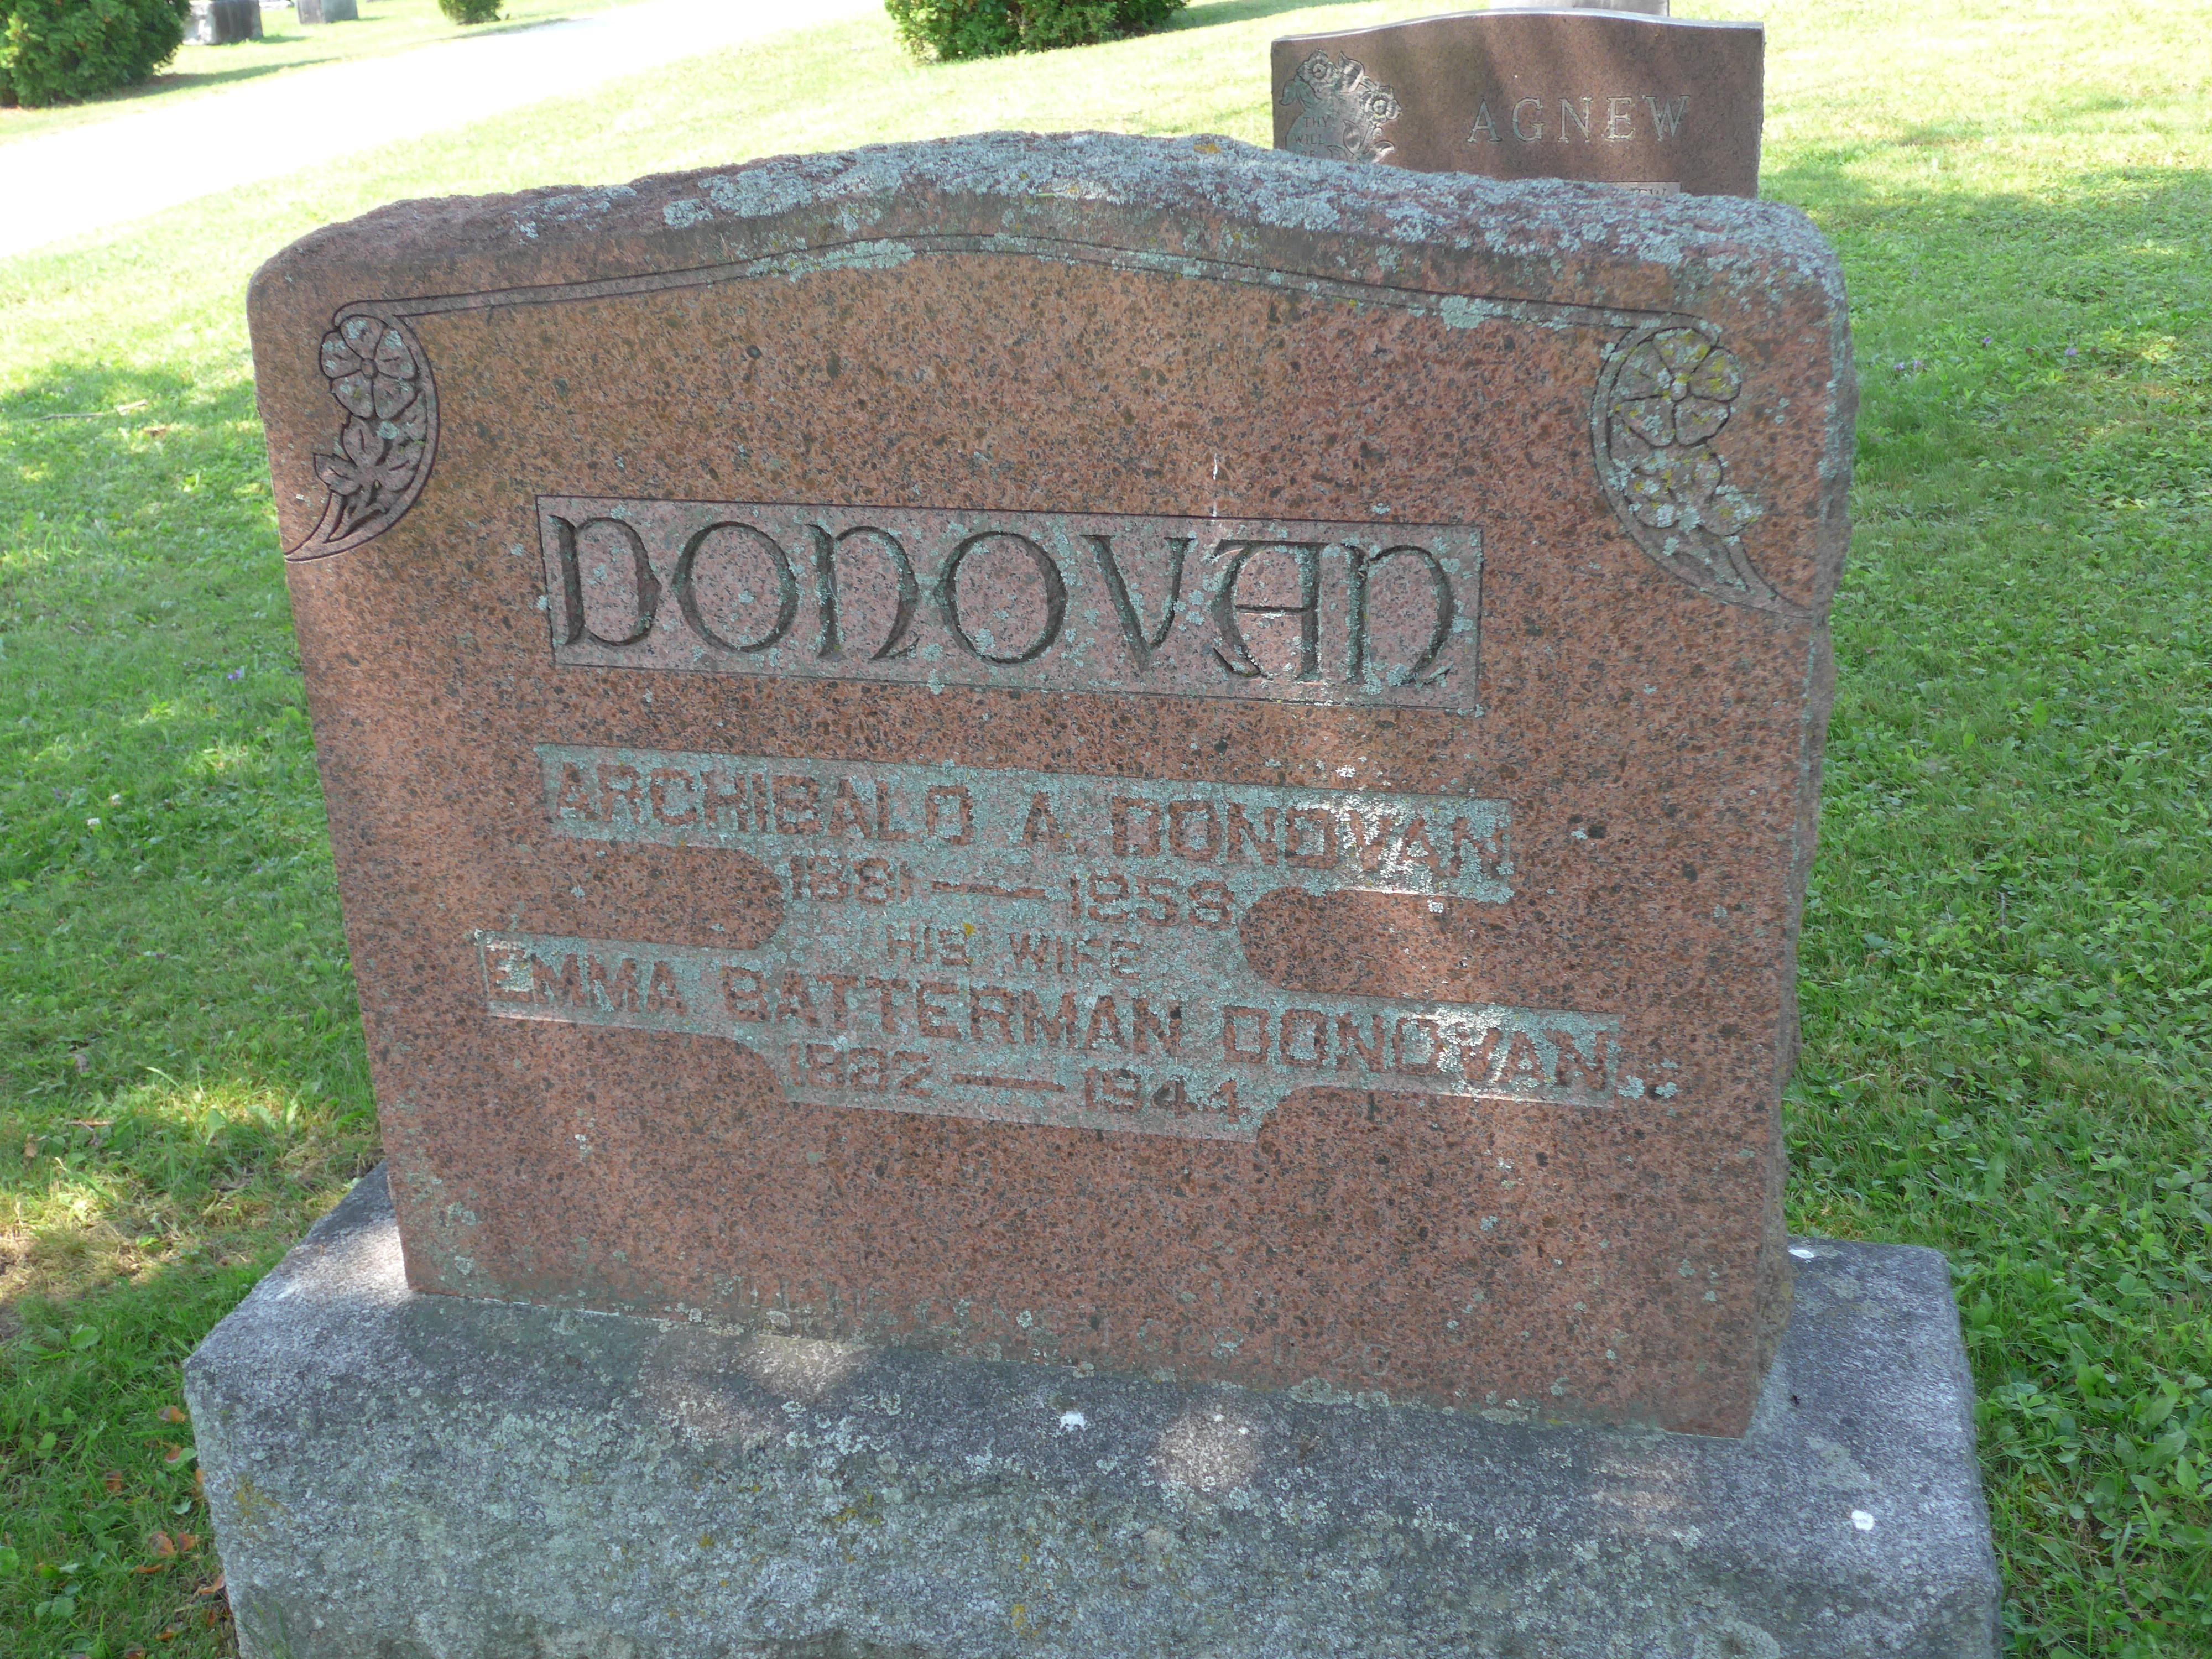 Archie Donovan